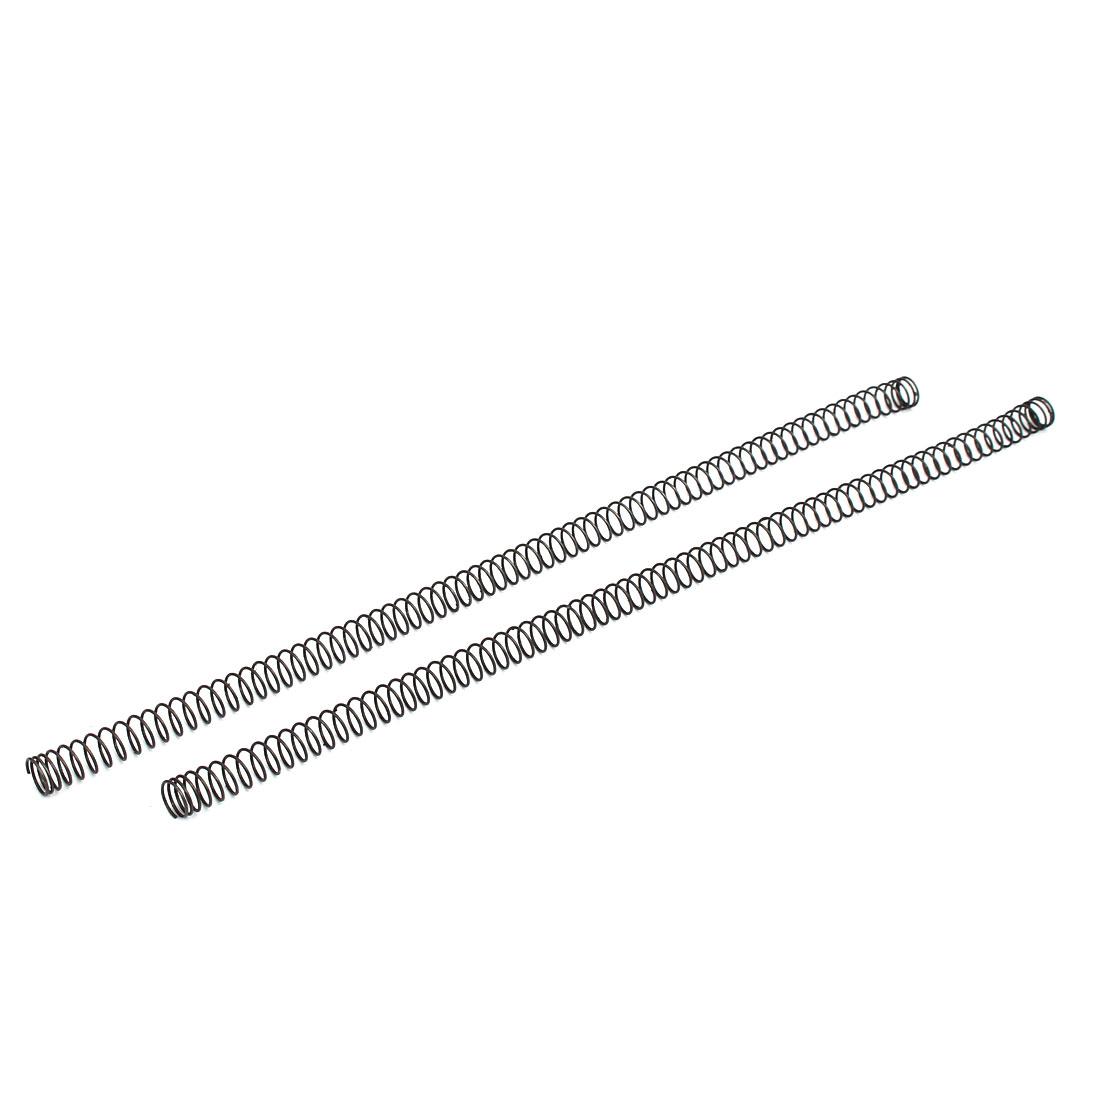 0.8mmx10mmx305mm Manganese Steel Compression Springs Black 2pcs